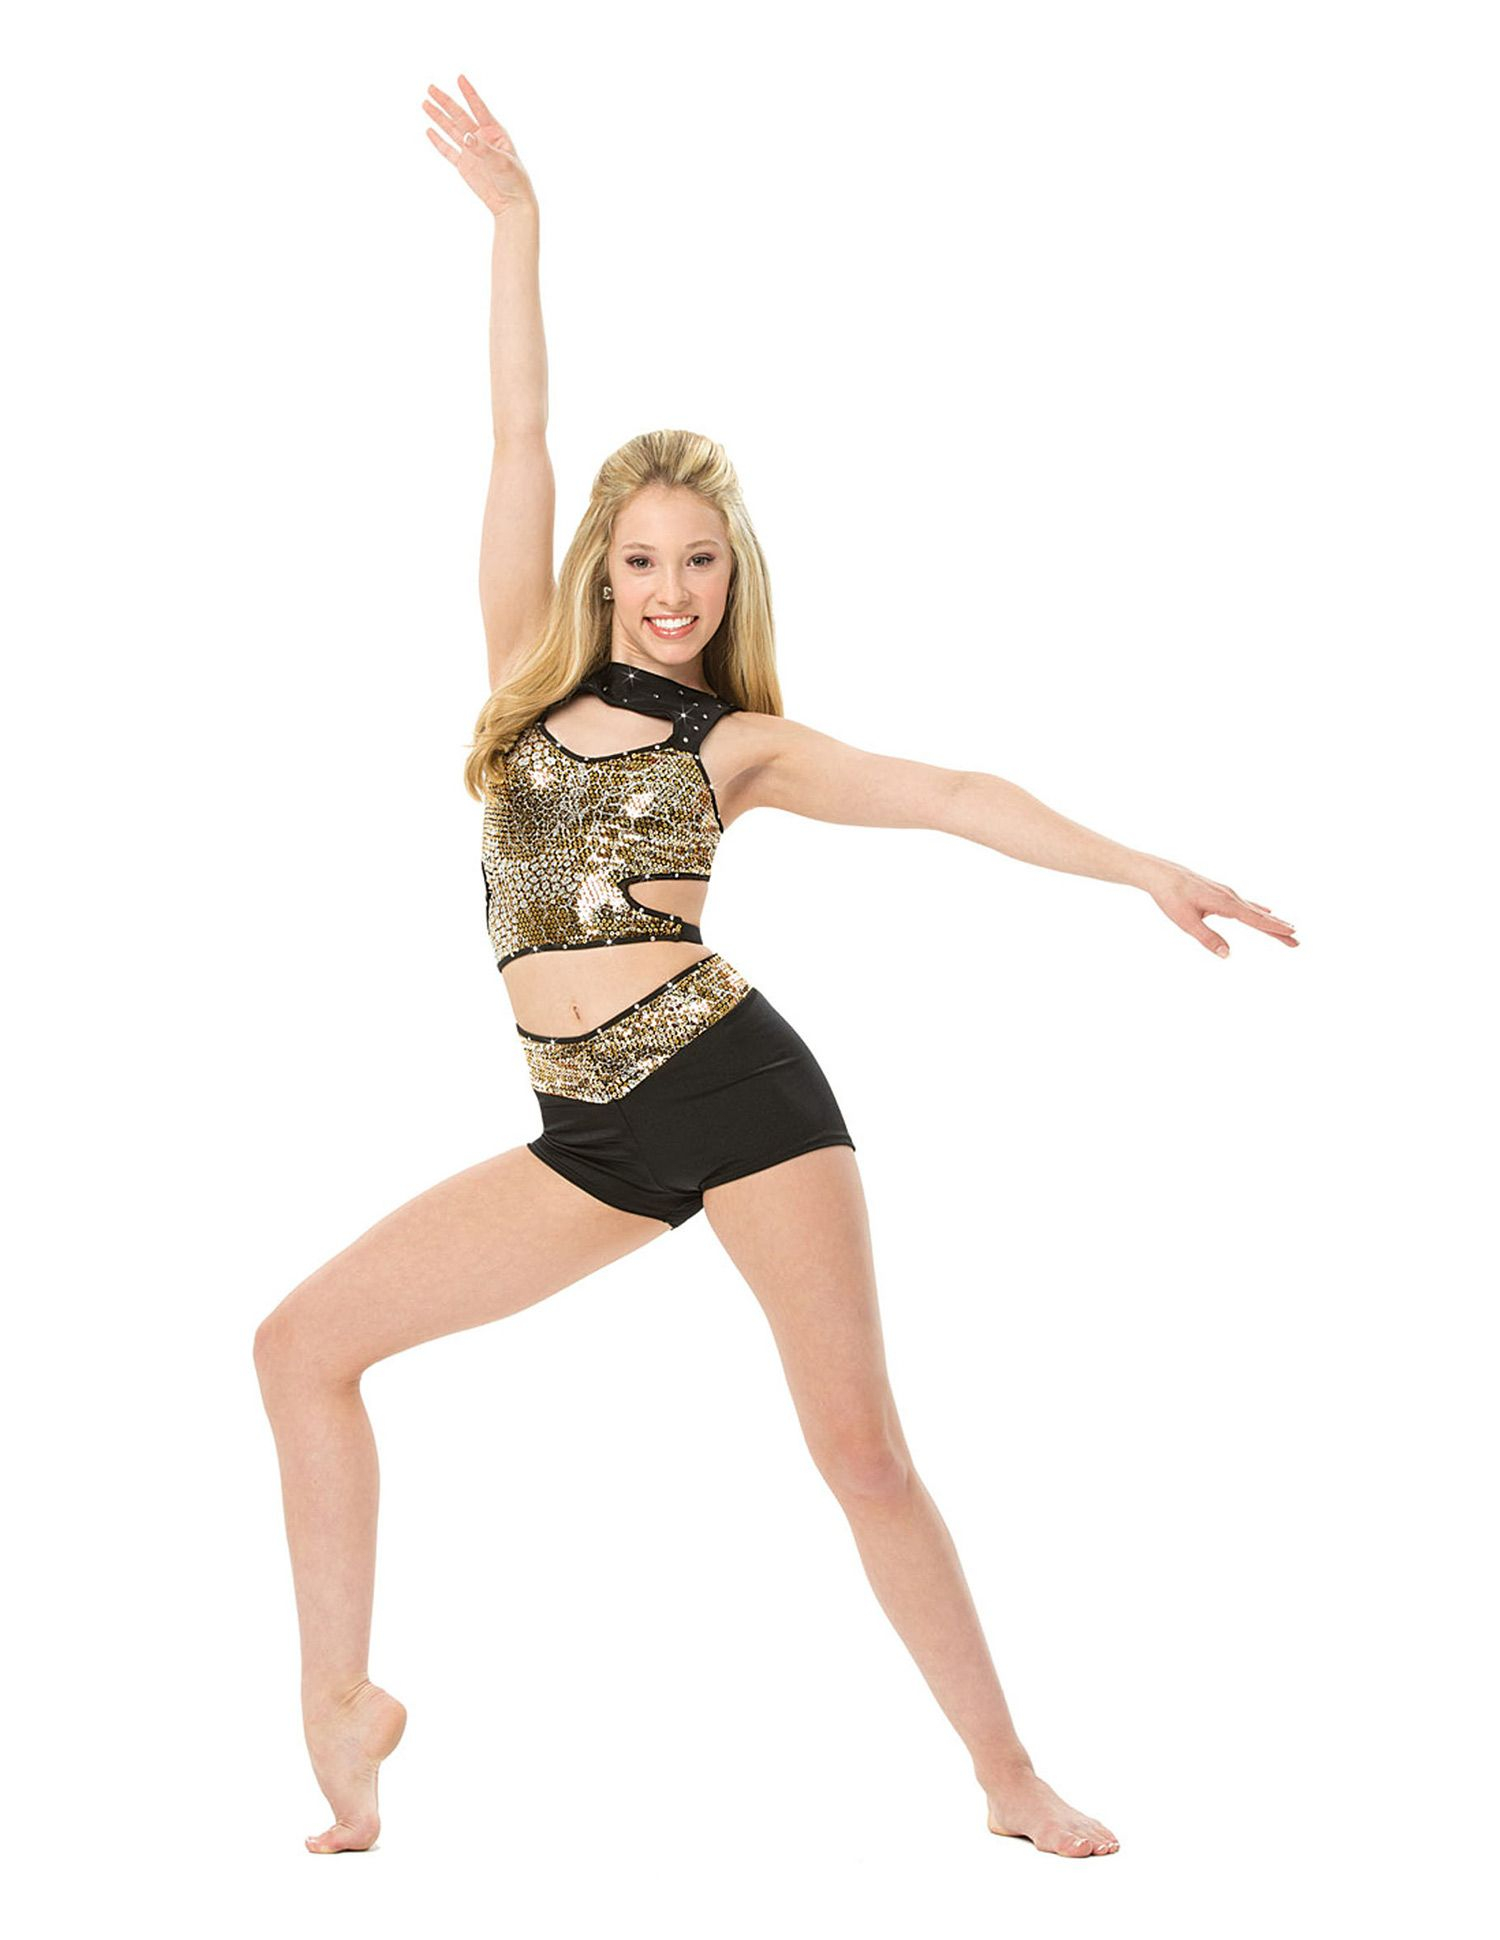 d799e9f0d Saunti Gold   Dance solo costumes   Jazz dance costumes, Dance ...